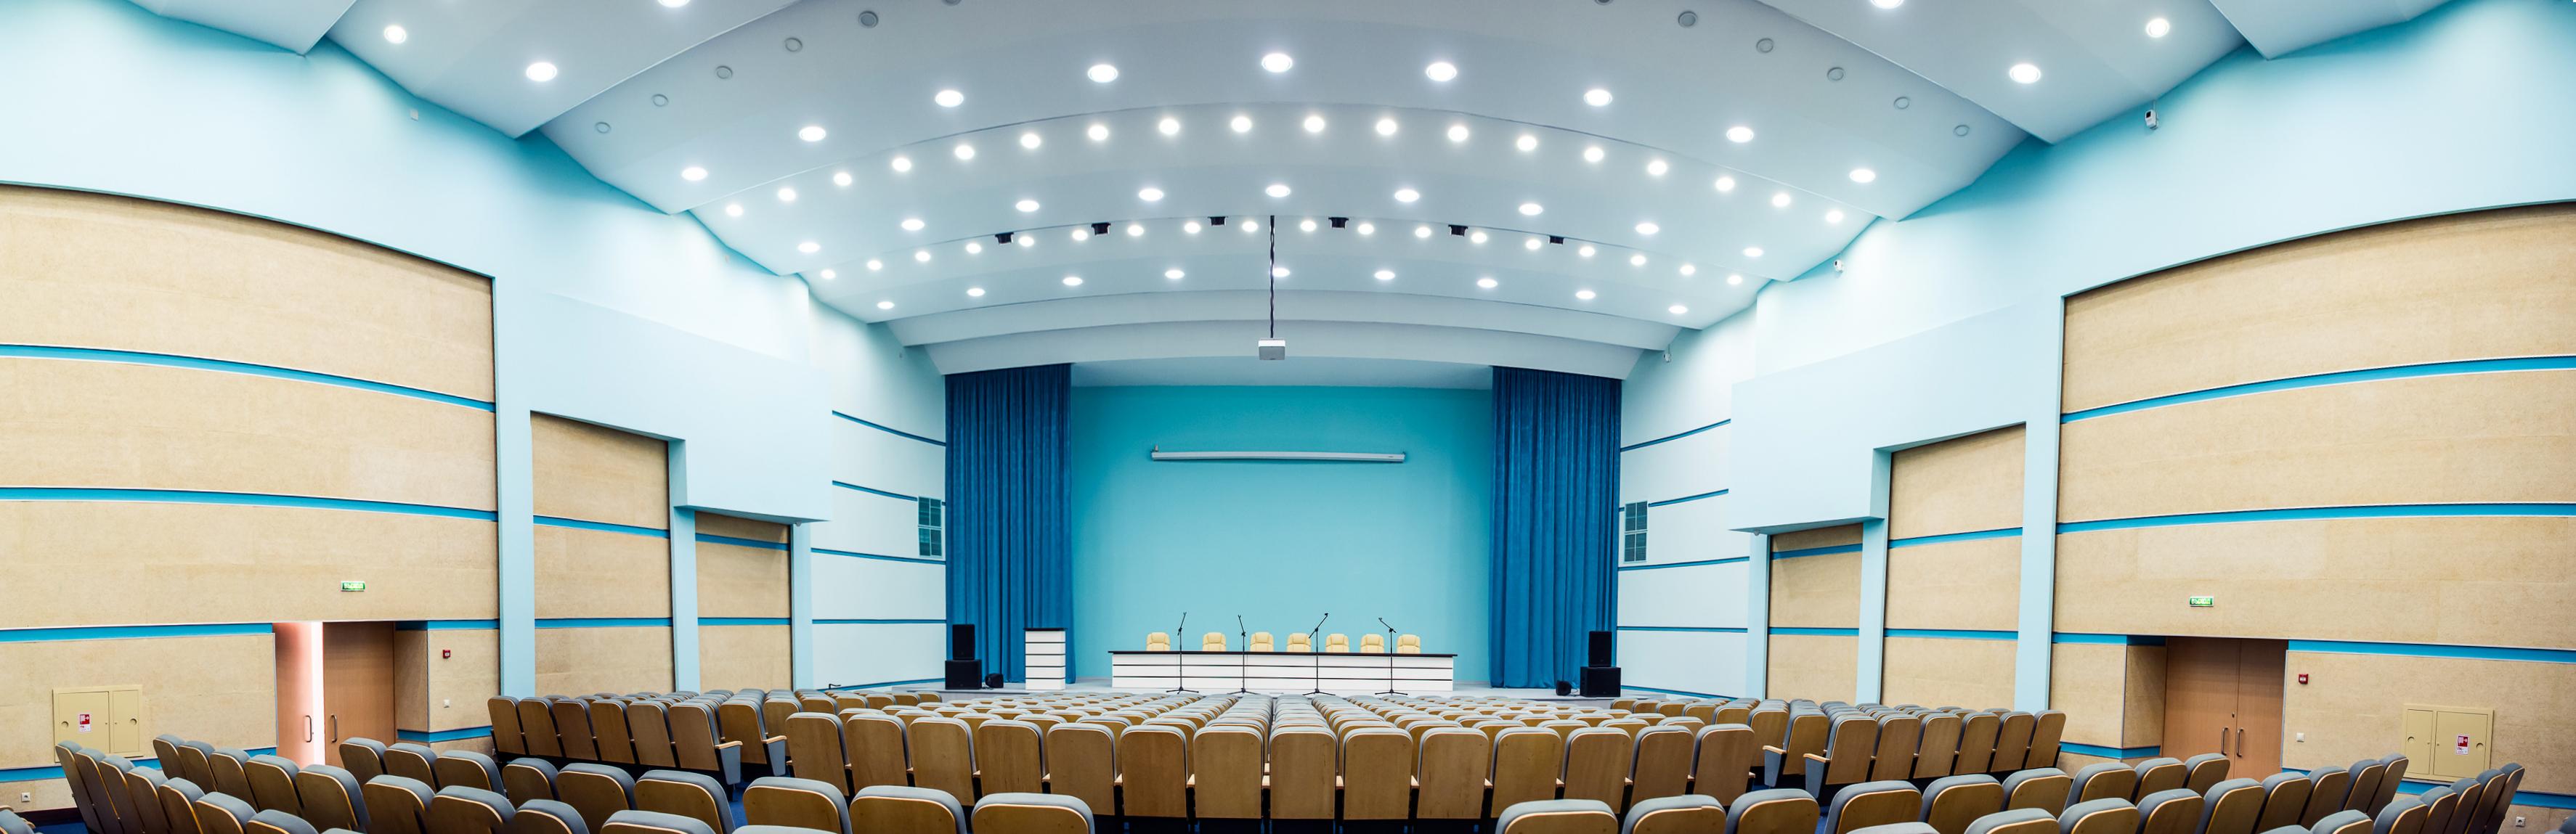 Конференц зал iskrahall.ru